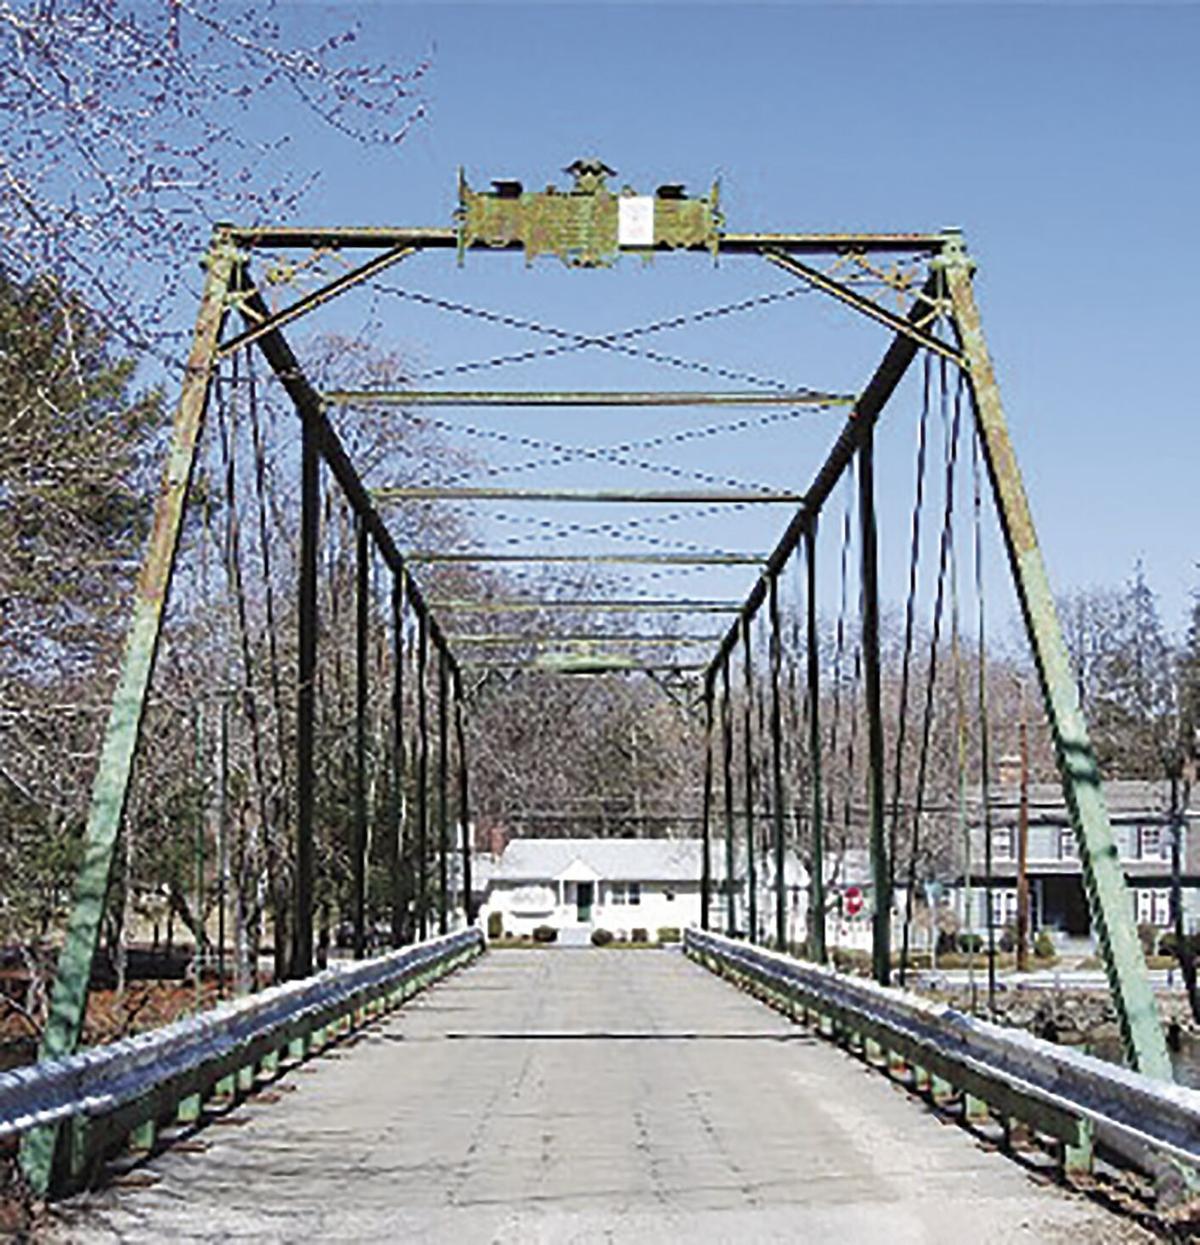 Efforts underway to save local historic bridge